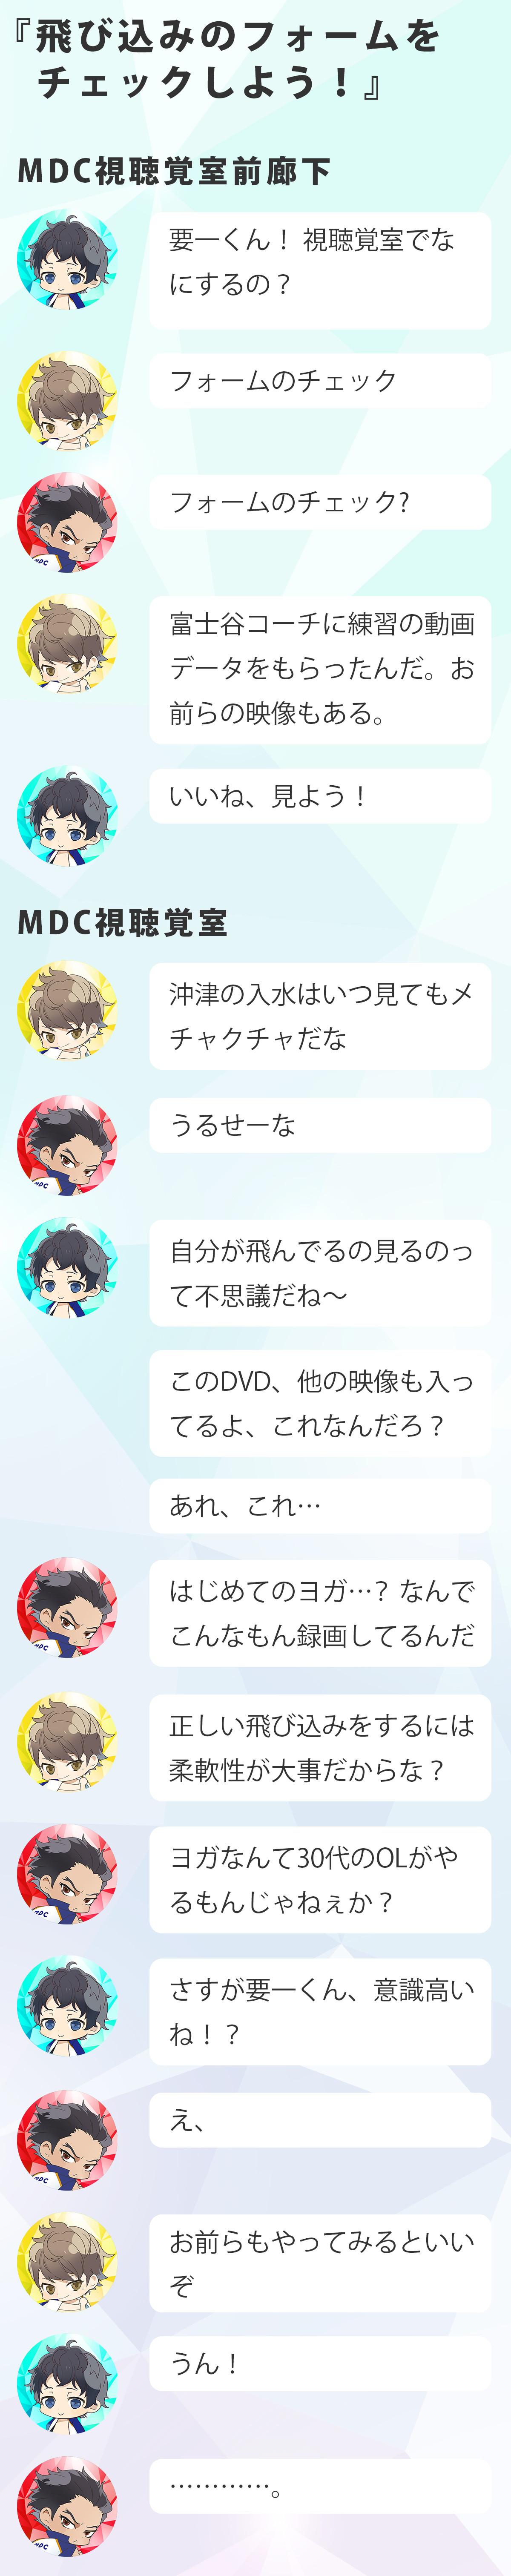 episode_01.jpg